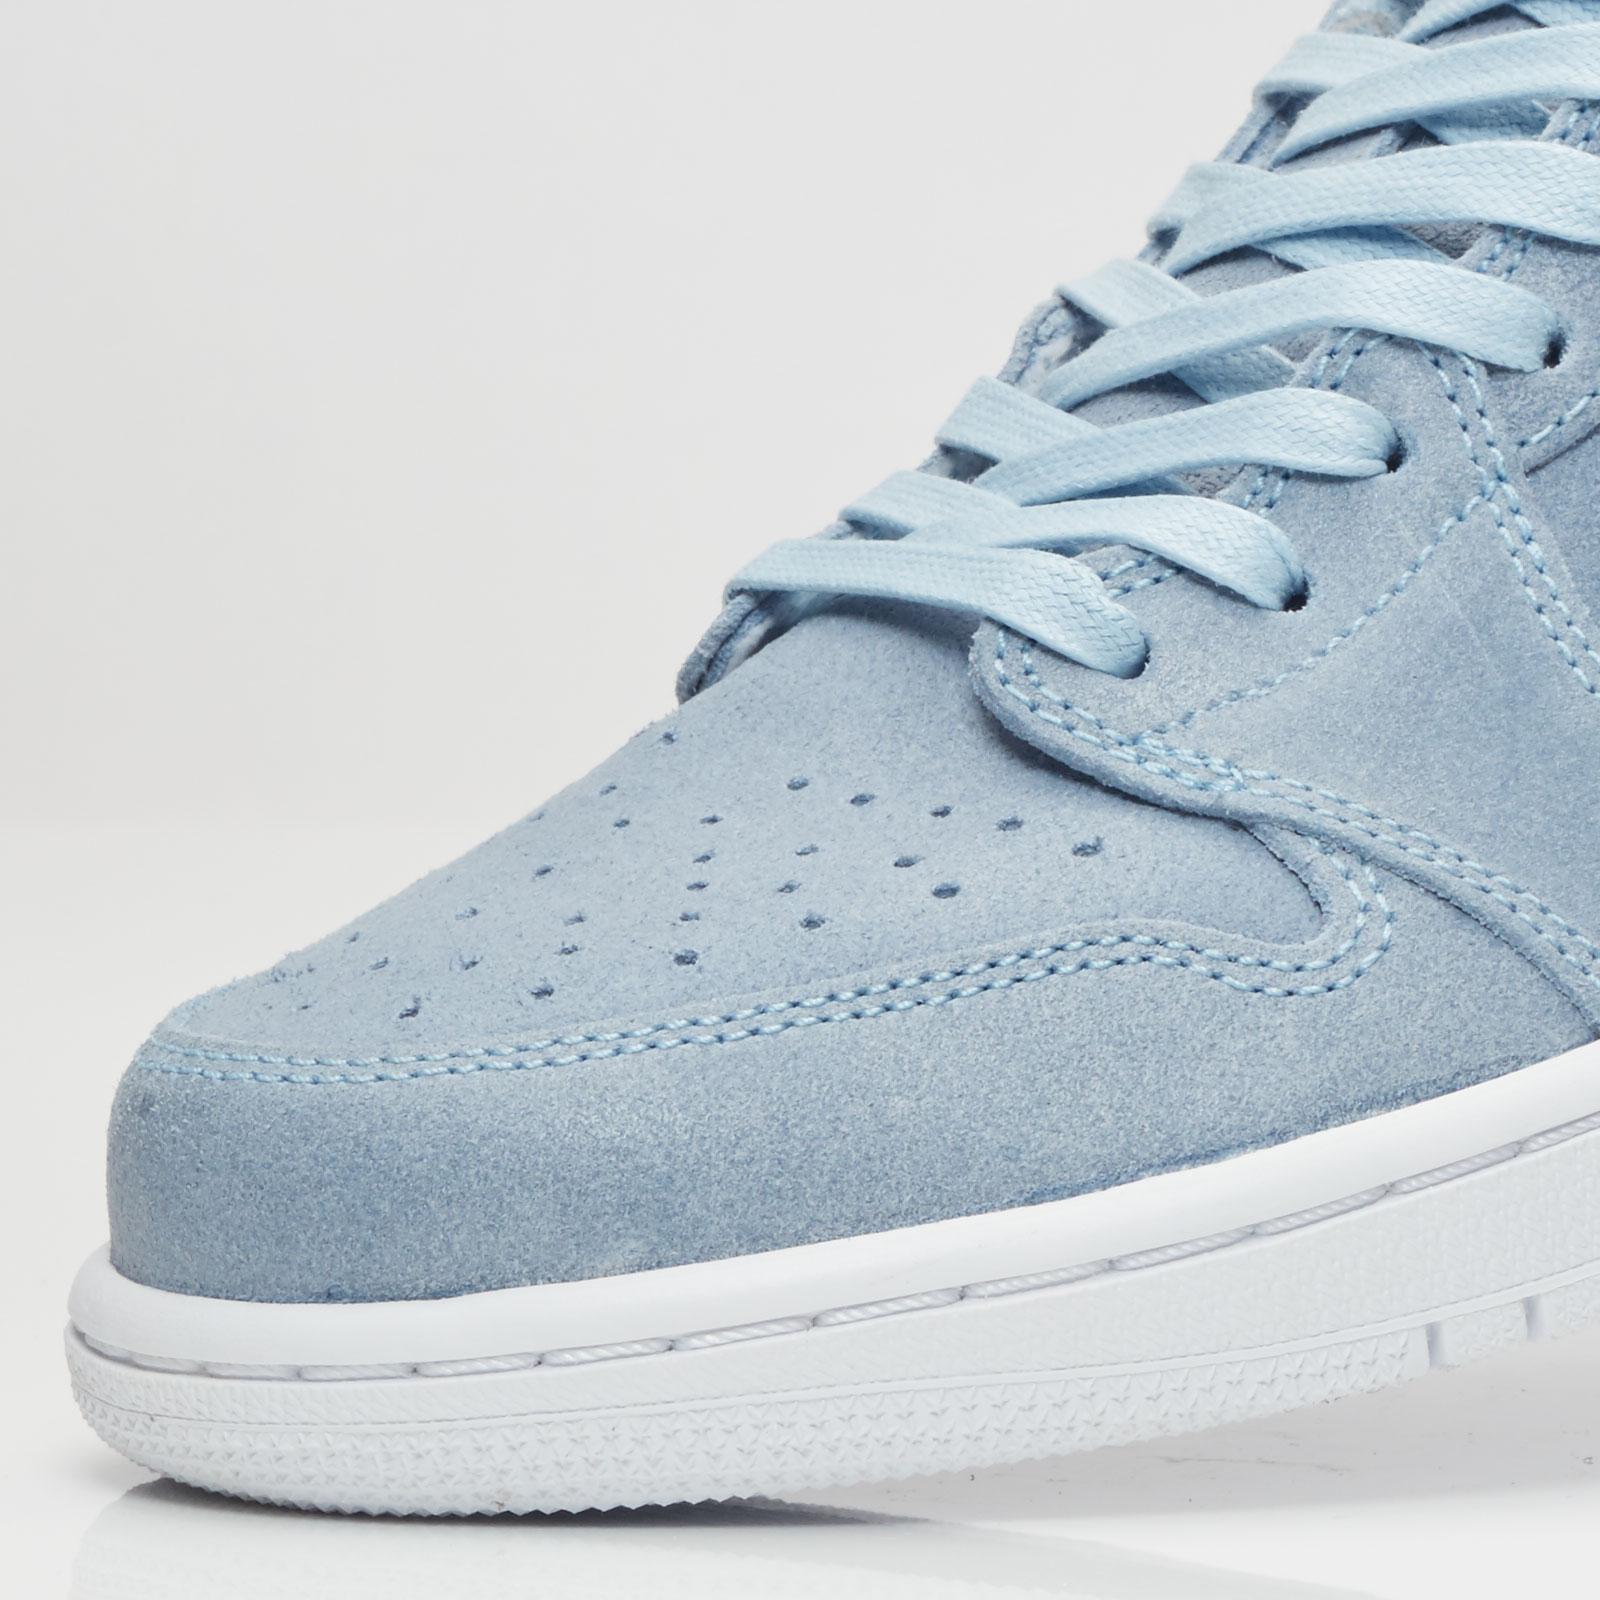 brand new 24656 4e341 ... Jordan Brand Air Jordan 1 Retro Low Og Premium ...